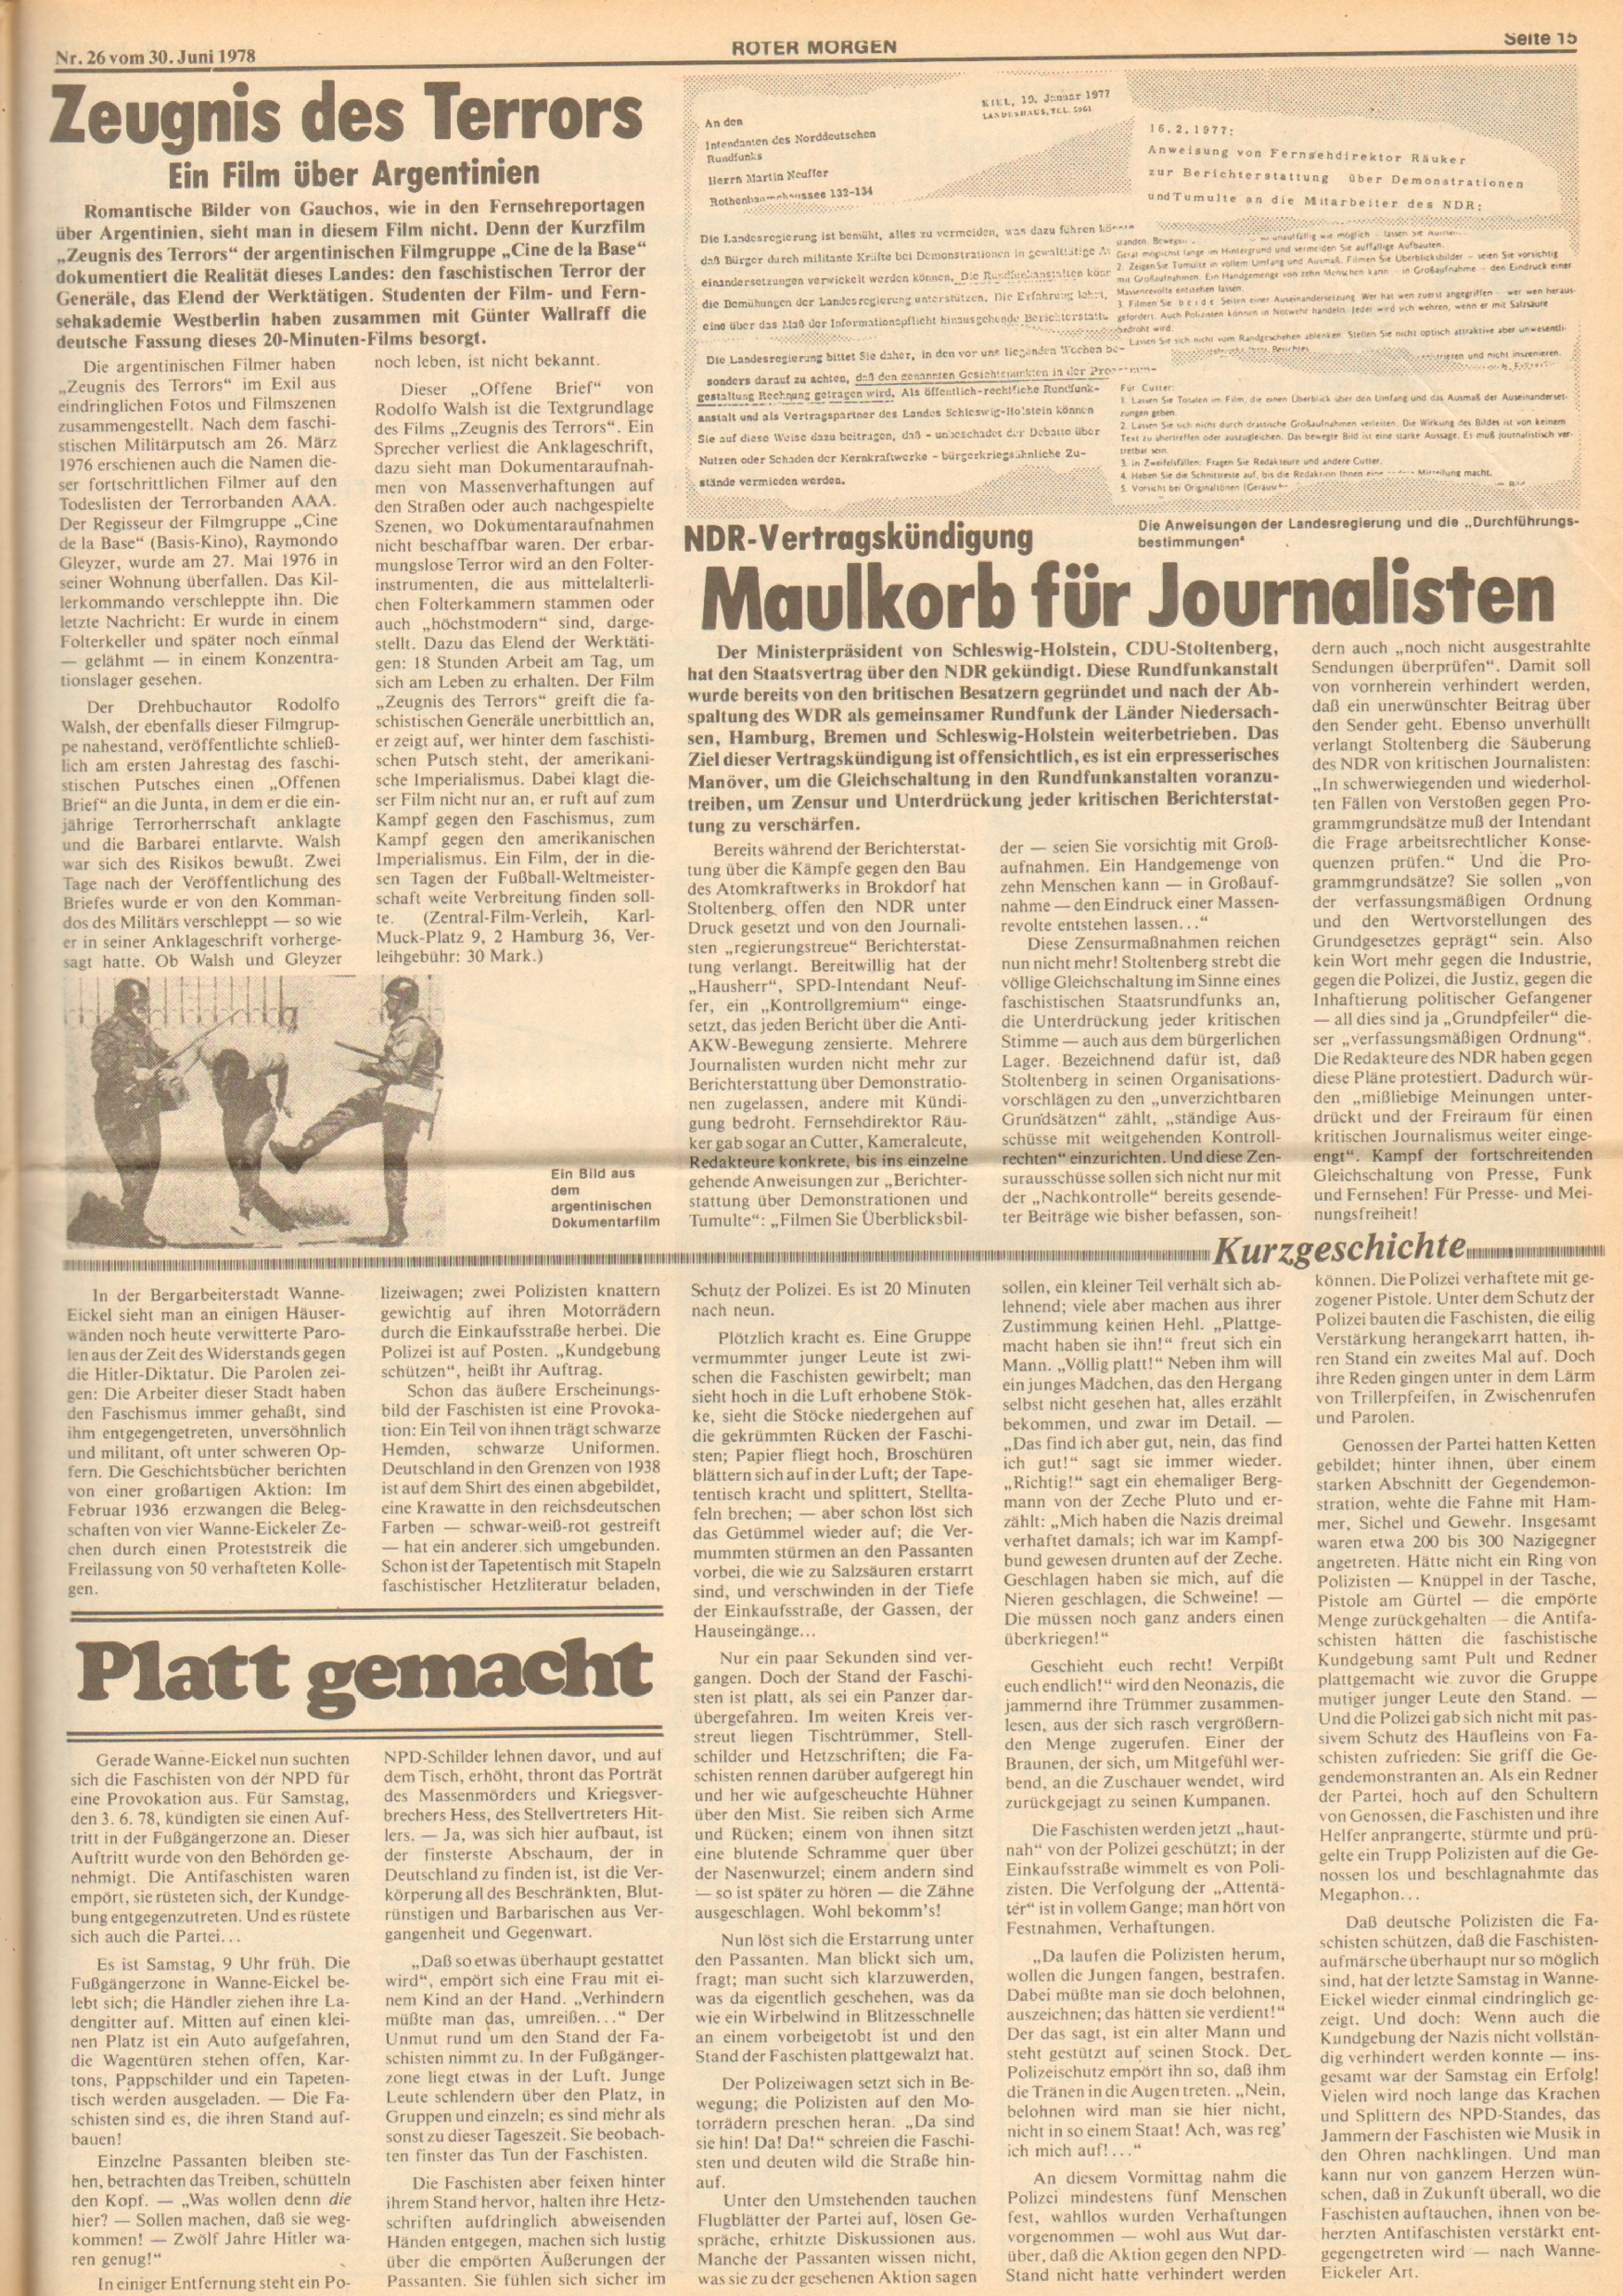 Roter Morgen, 12. Jg., 30. Juni 1978, Nr. 26, Seite 15